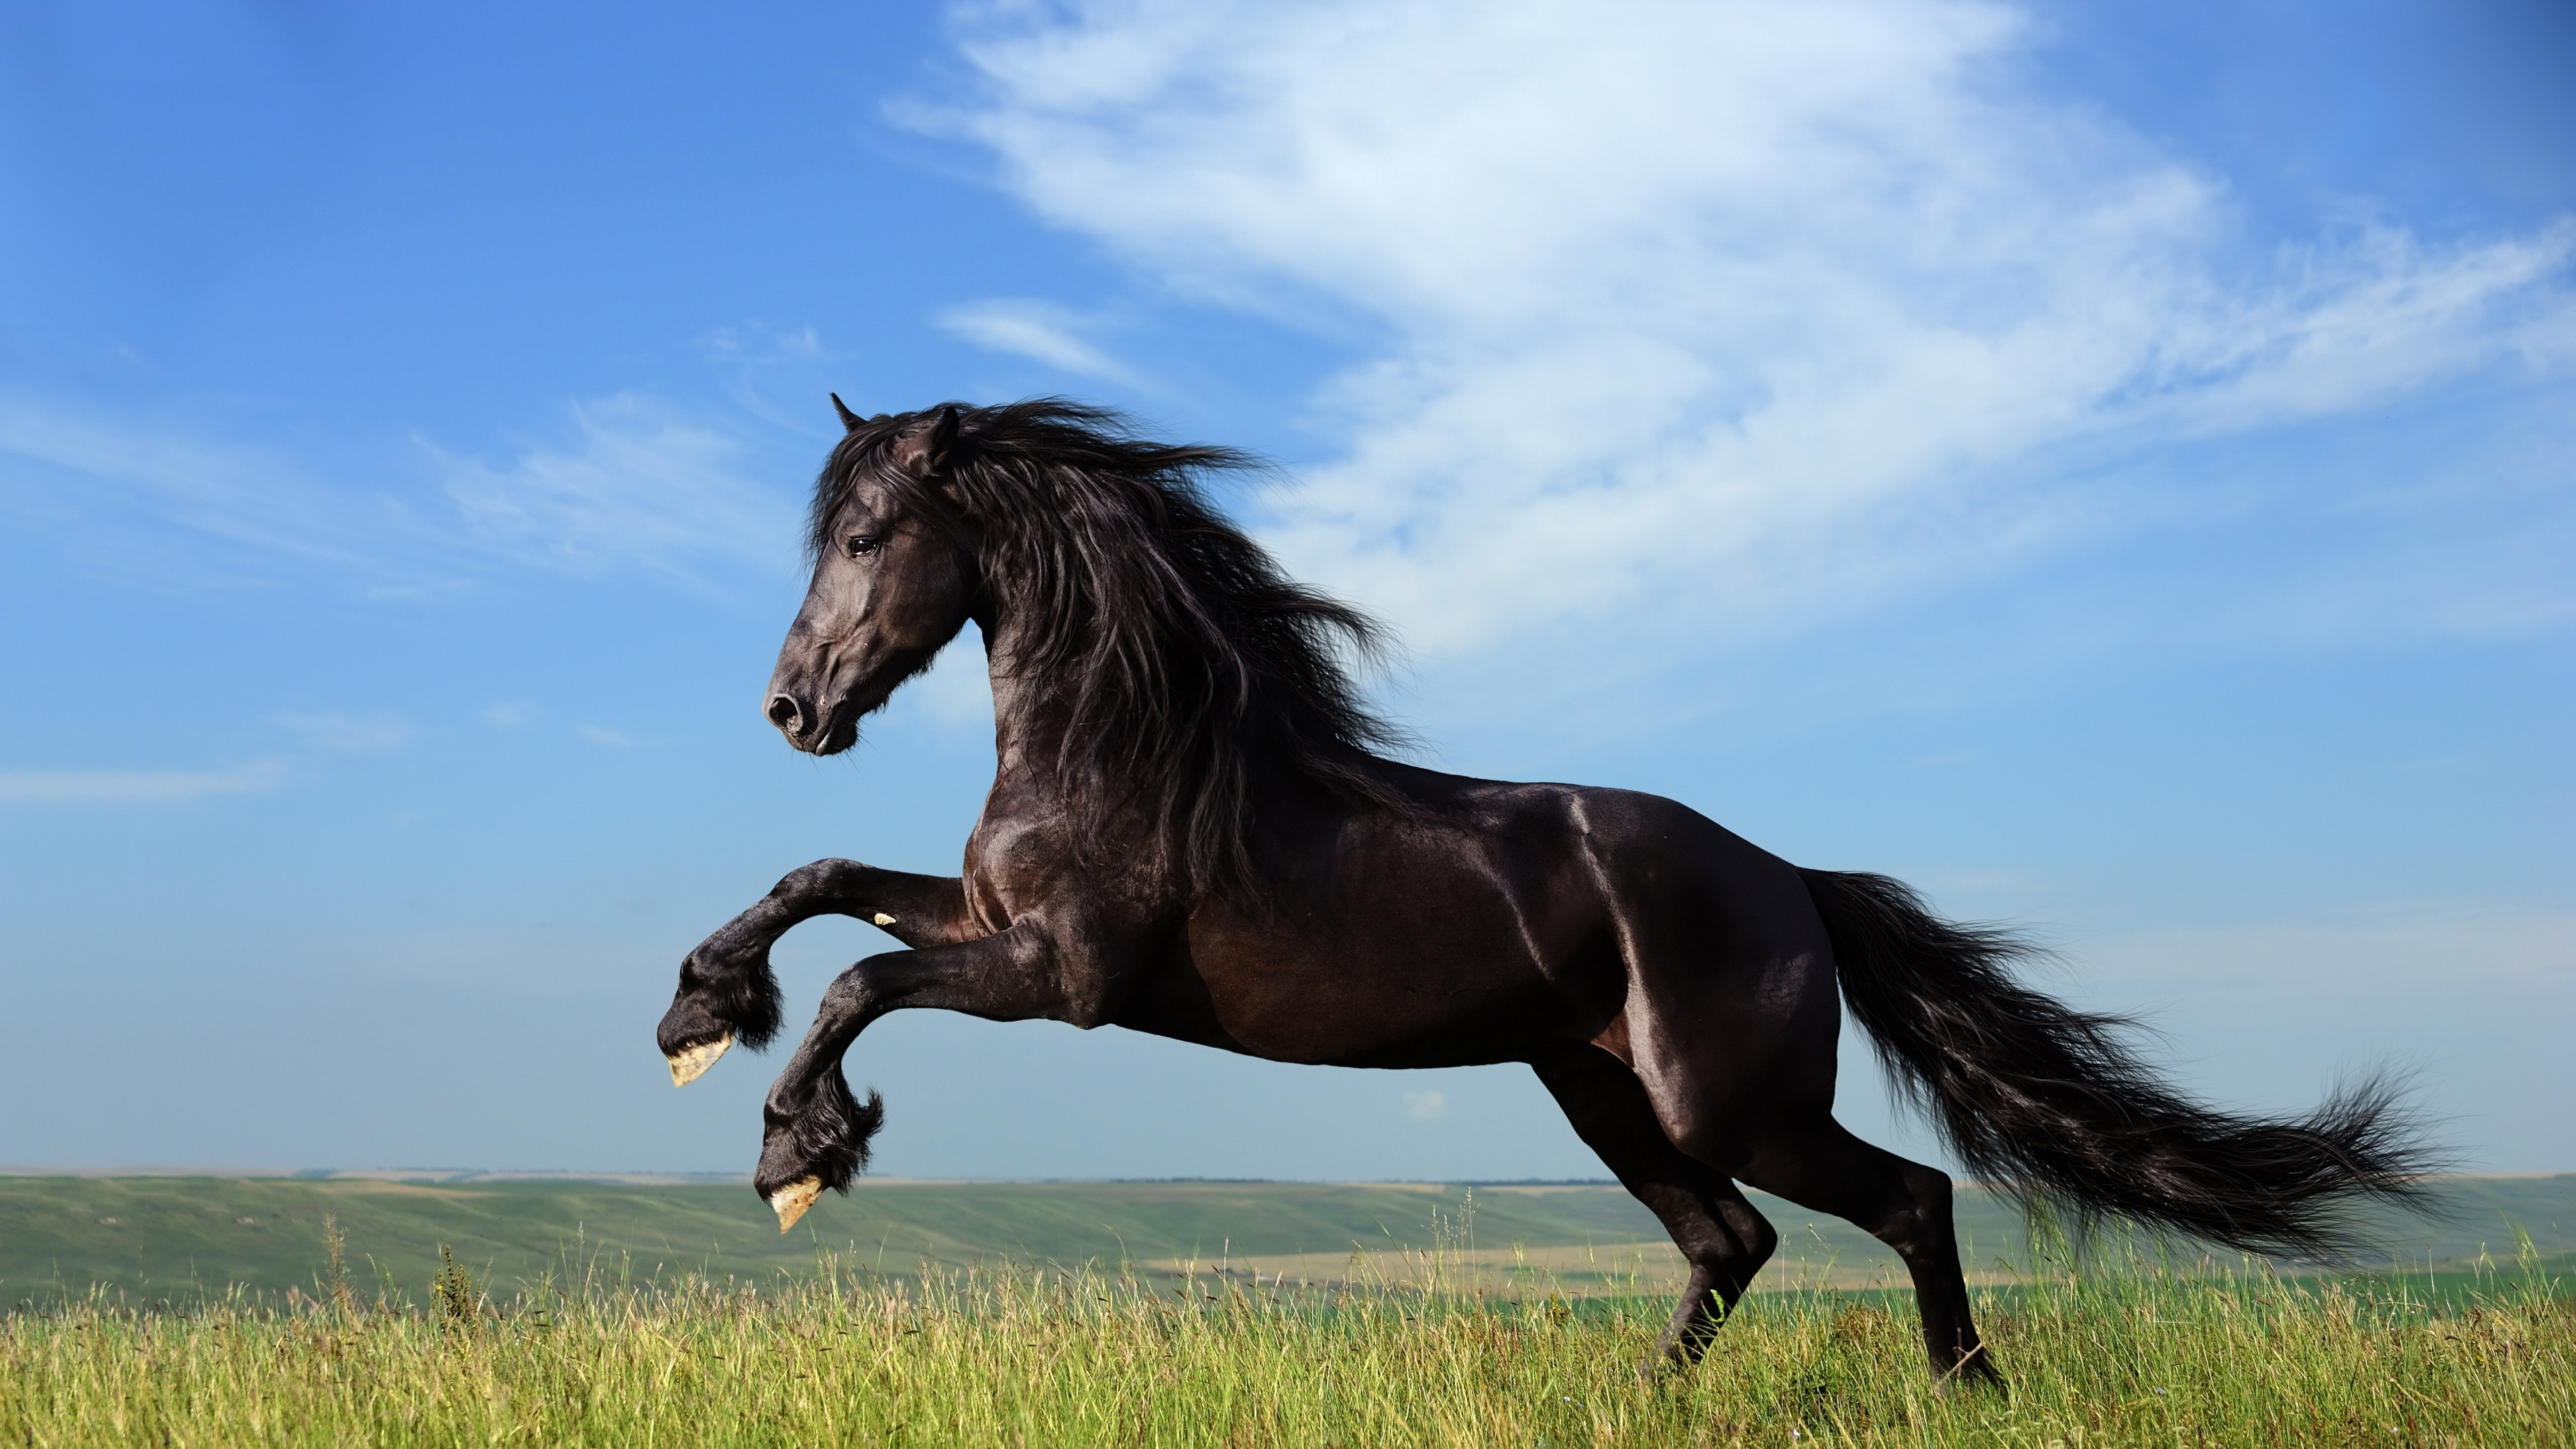 horse jump 4k 1542237857 - Horse Jump 4k - jump wallpapers, horse wallpapers, black wallpapers, animals wallpapers